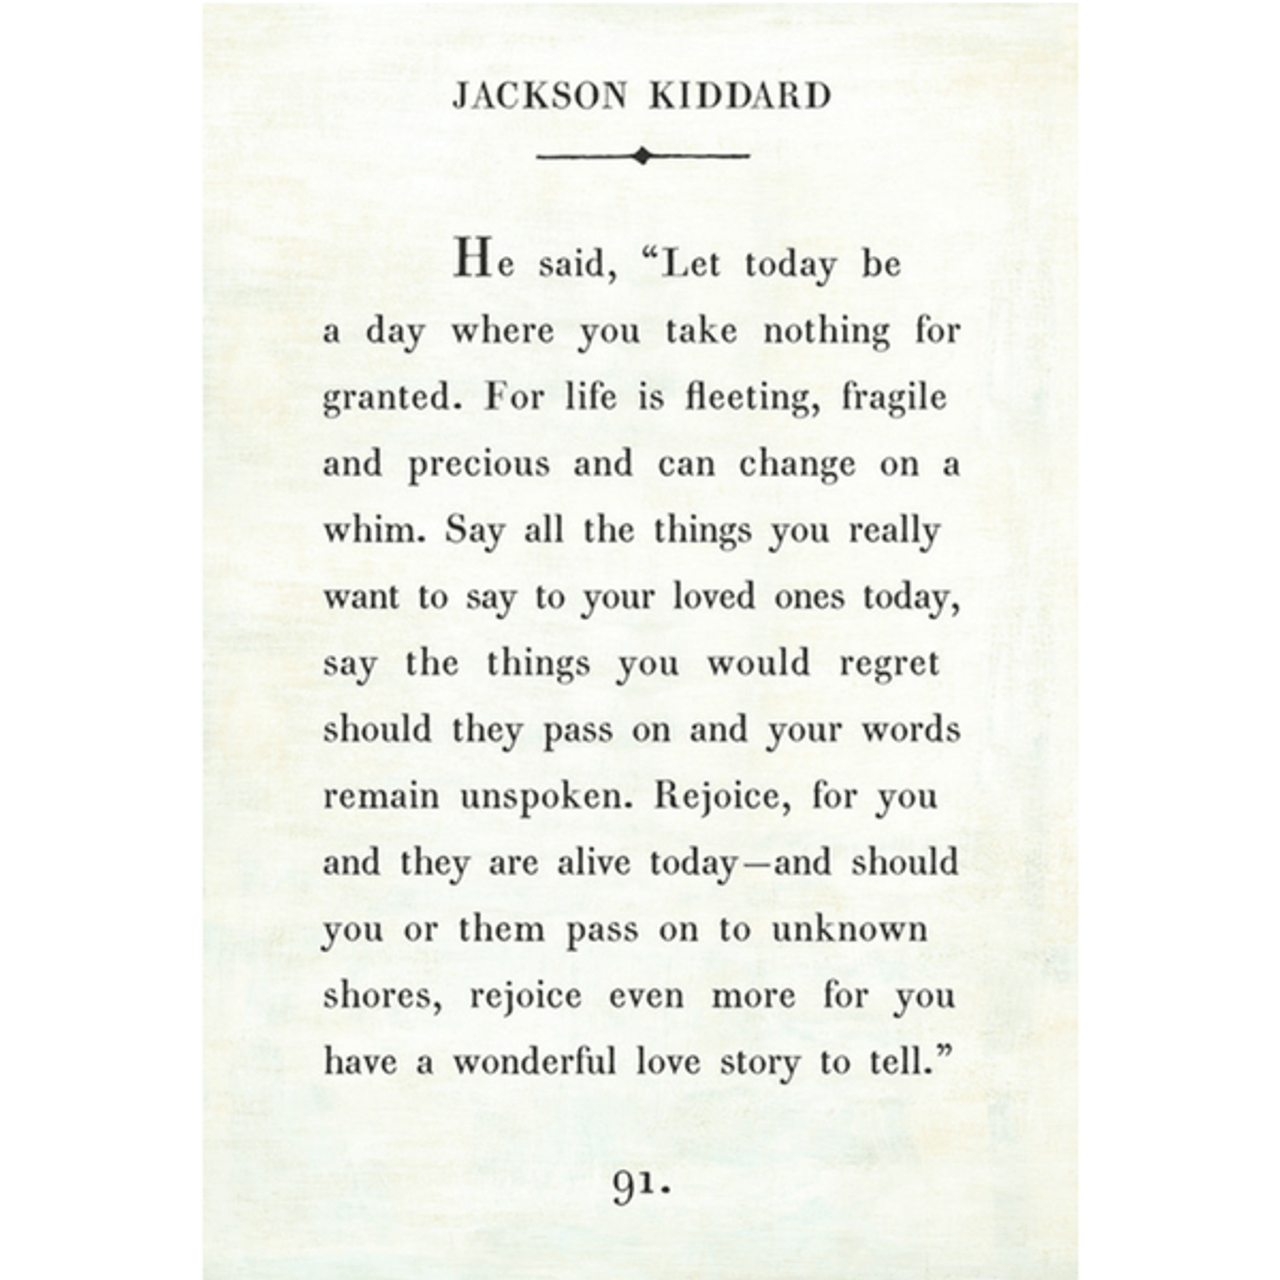 jackson kiddard art print - white with gallery wrap frame